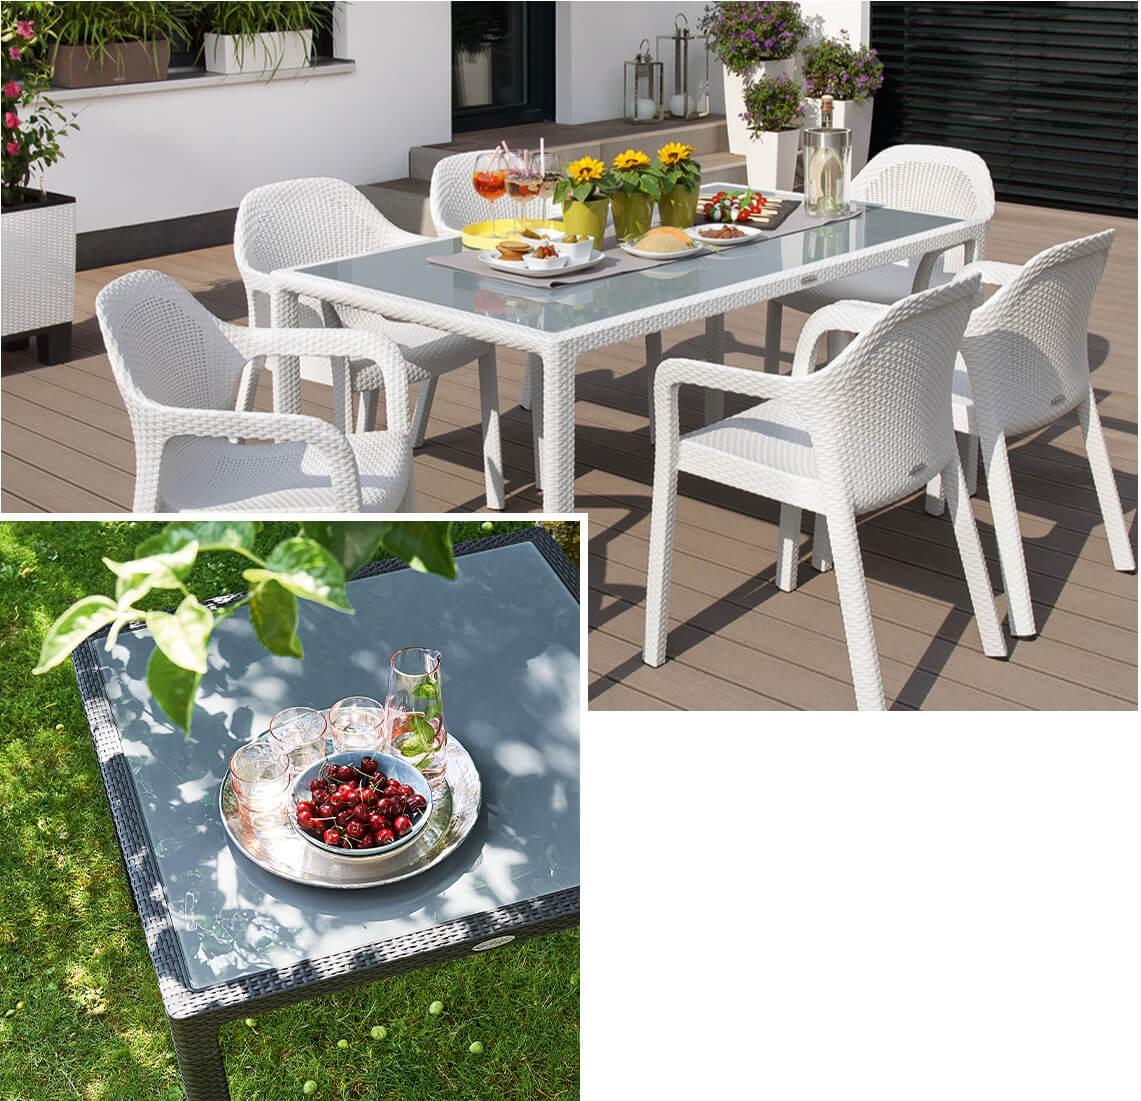 LECHUZA garden tables in white and granite